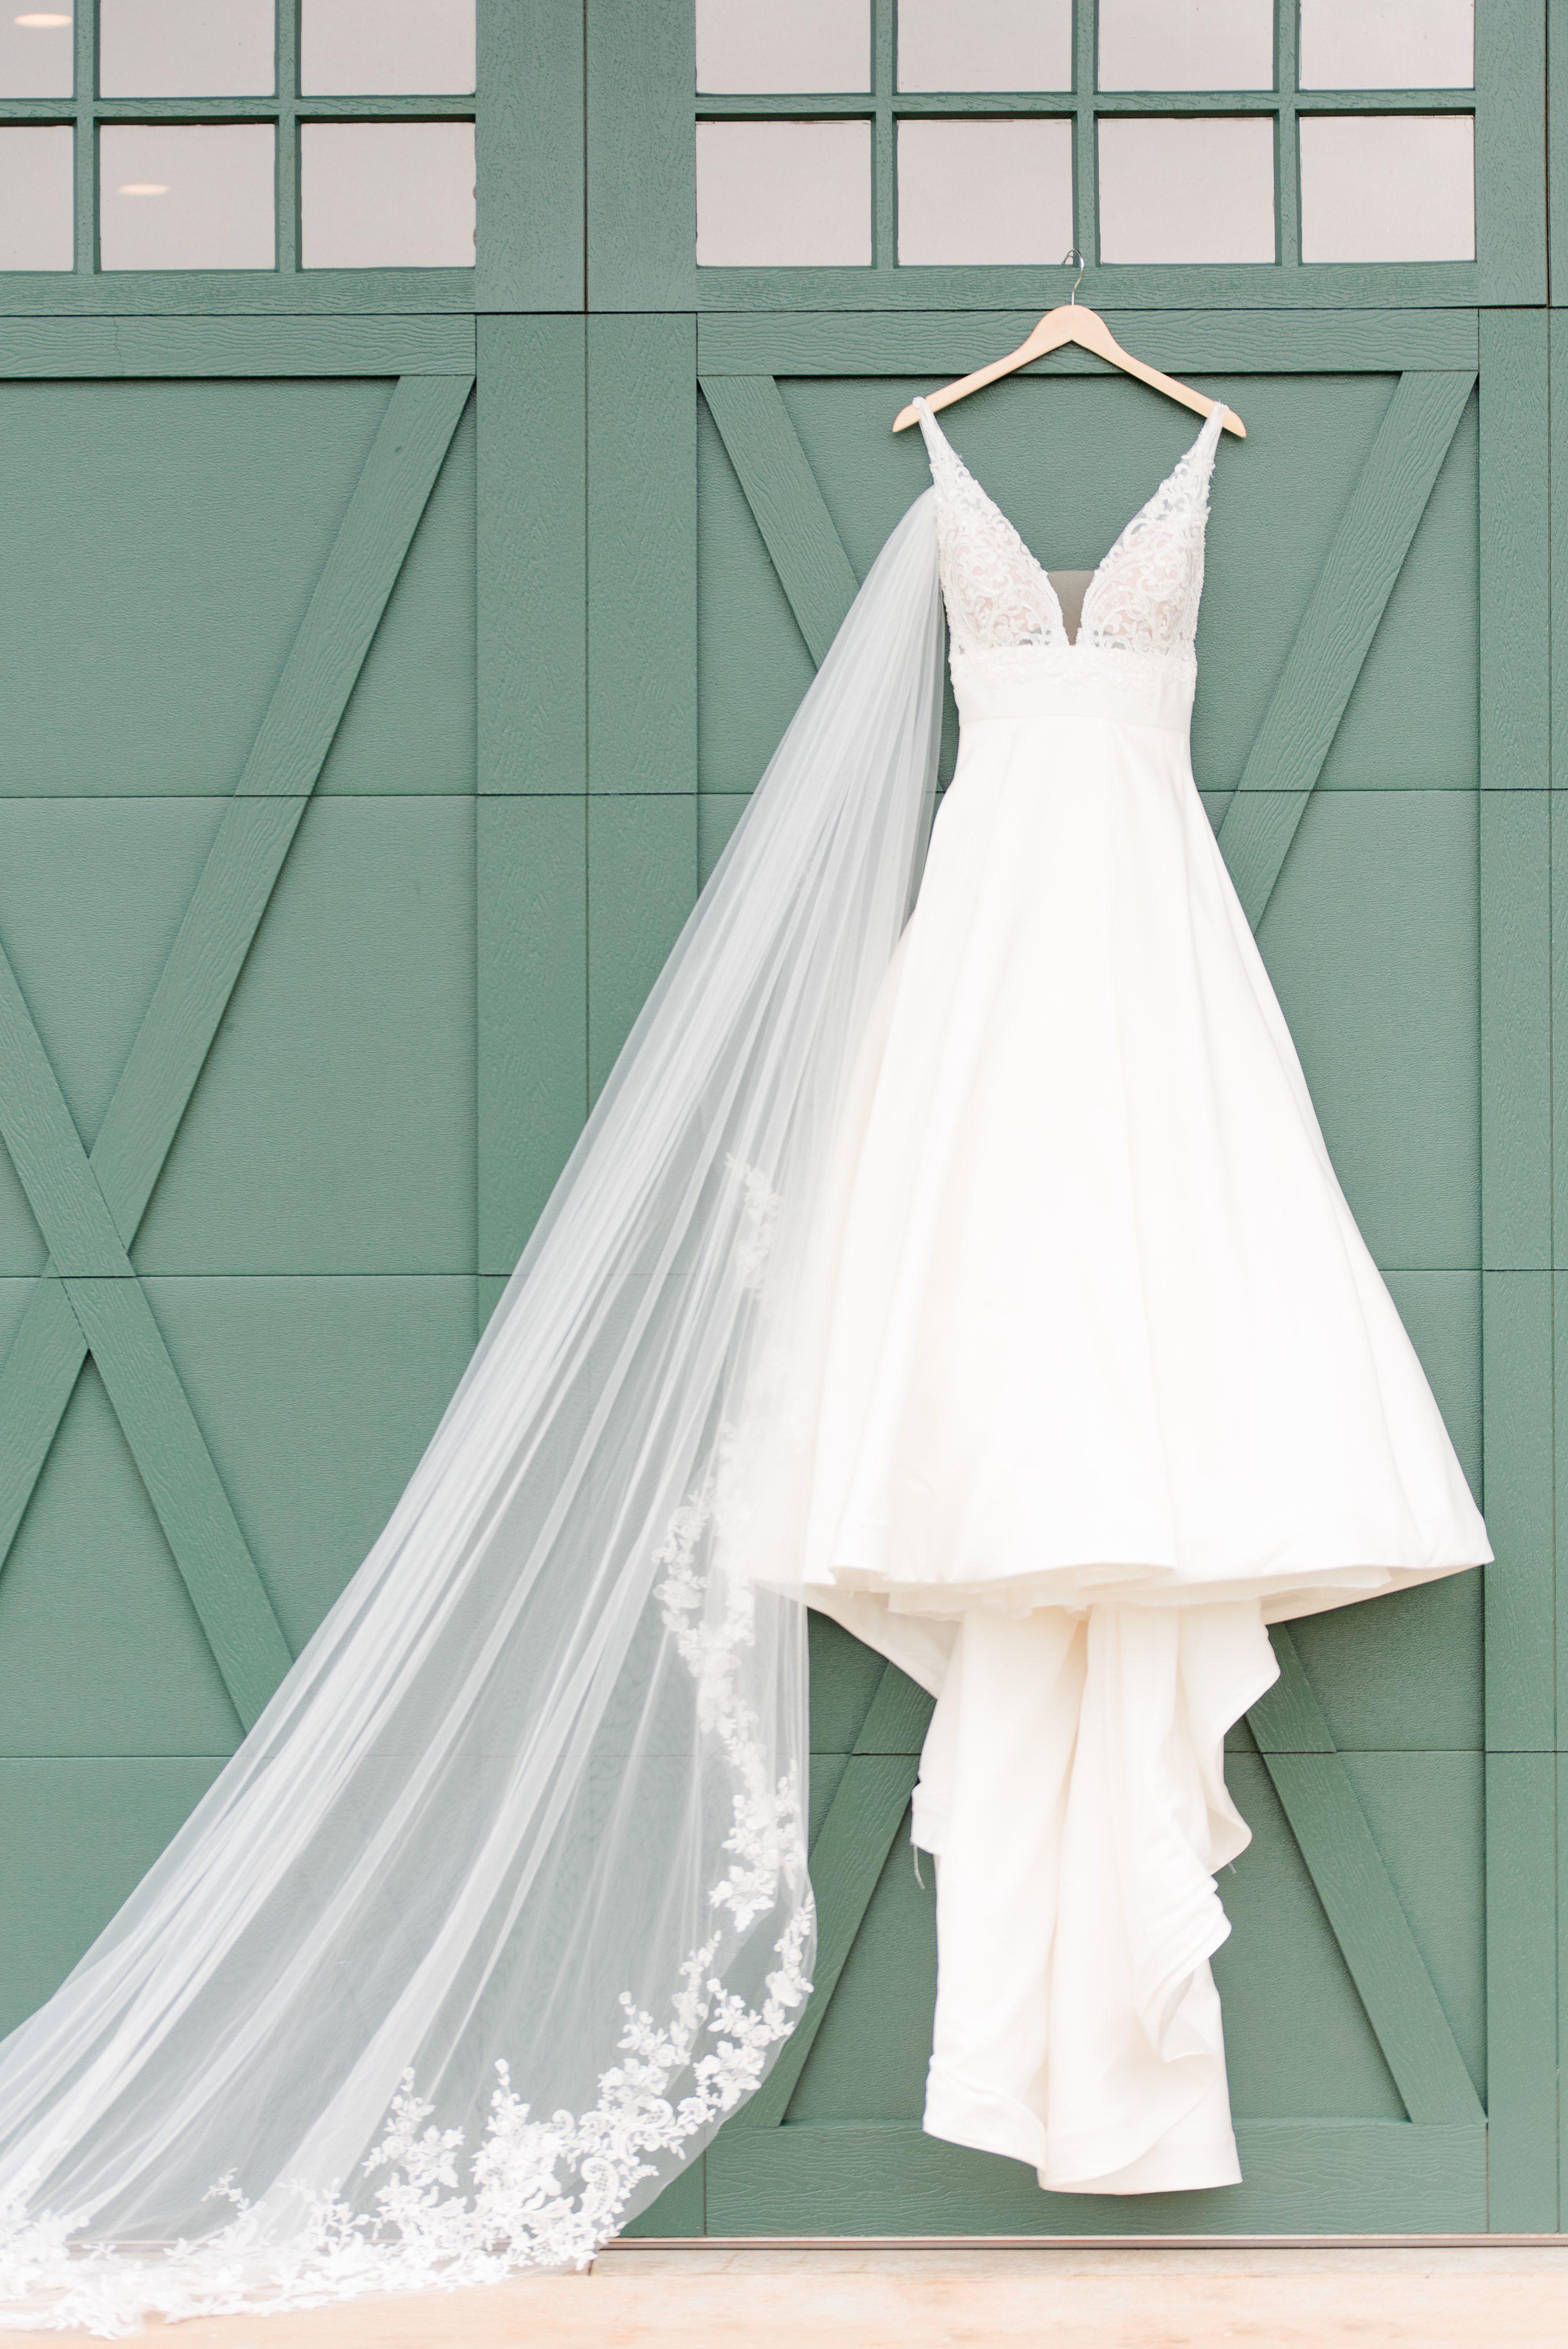 Blue Ridge Mountains Wedding,Wedding Dress,Wedding Veil,Veil,Dress,hanging dress,barn doors